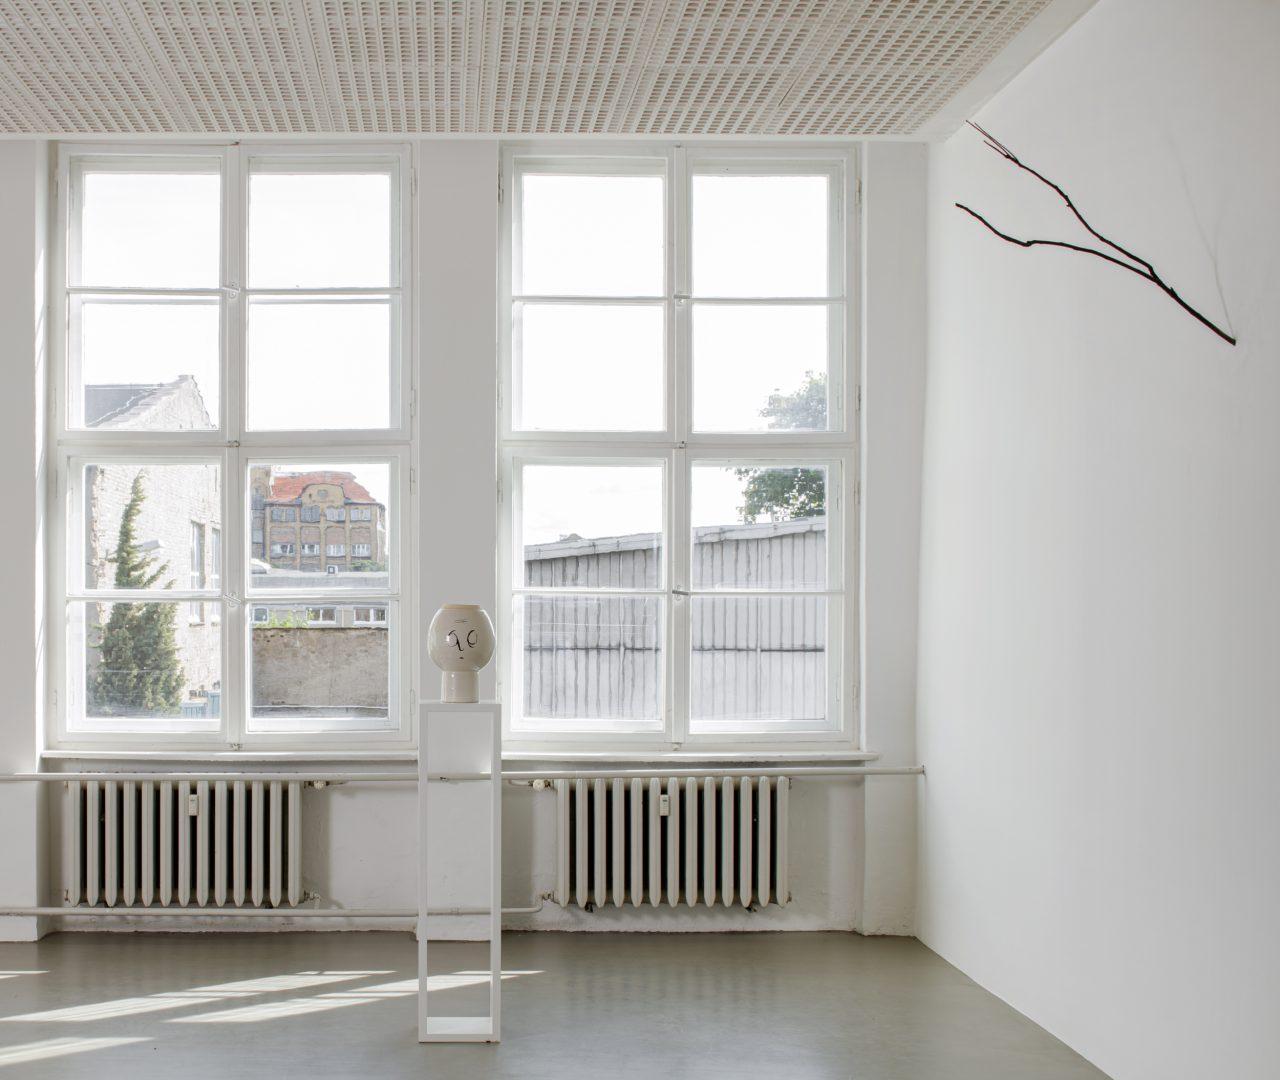 Judith Hopf: Luft, Installationsansicht